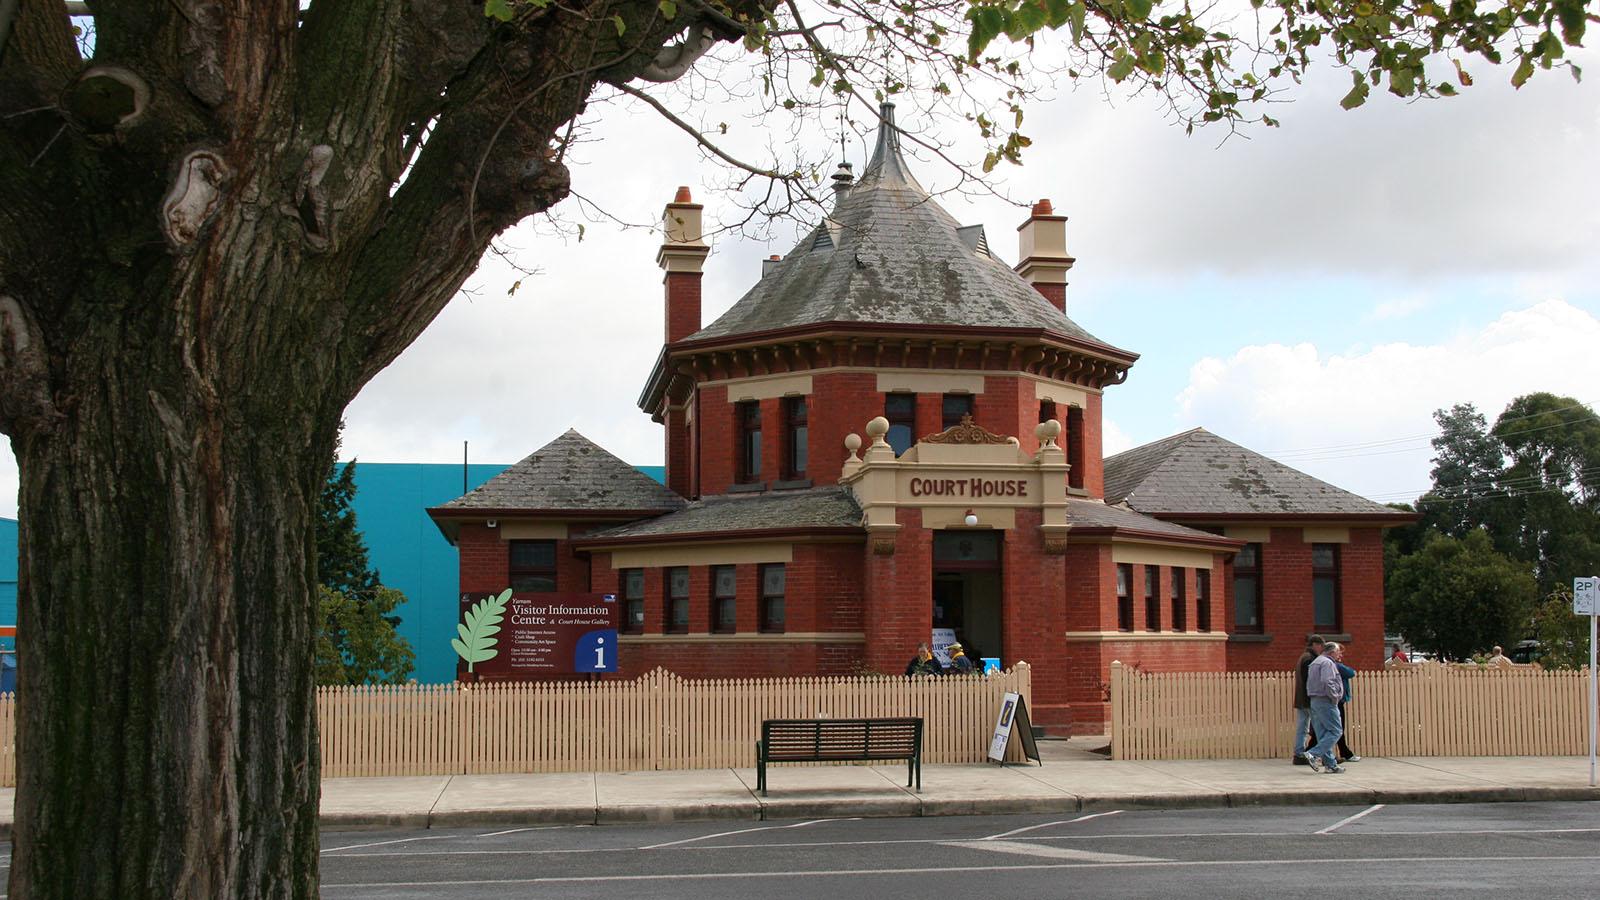 Yarram Courthouse, Gippsland, Victoria, Australia